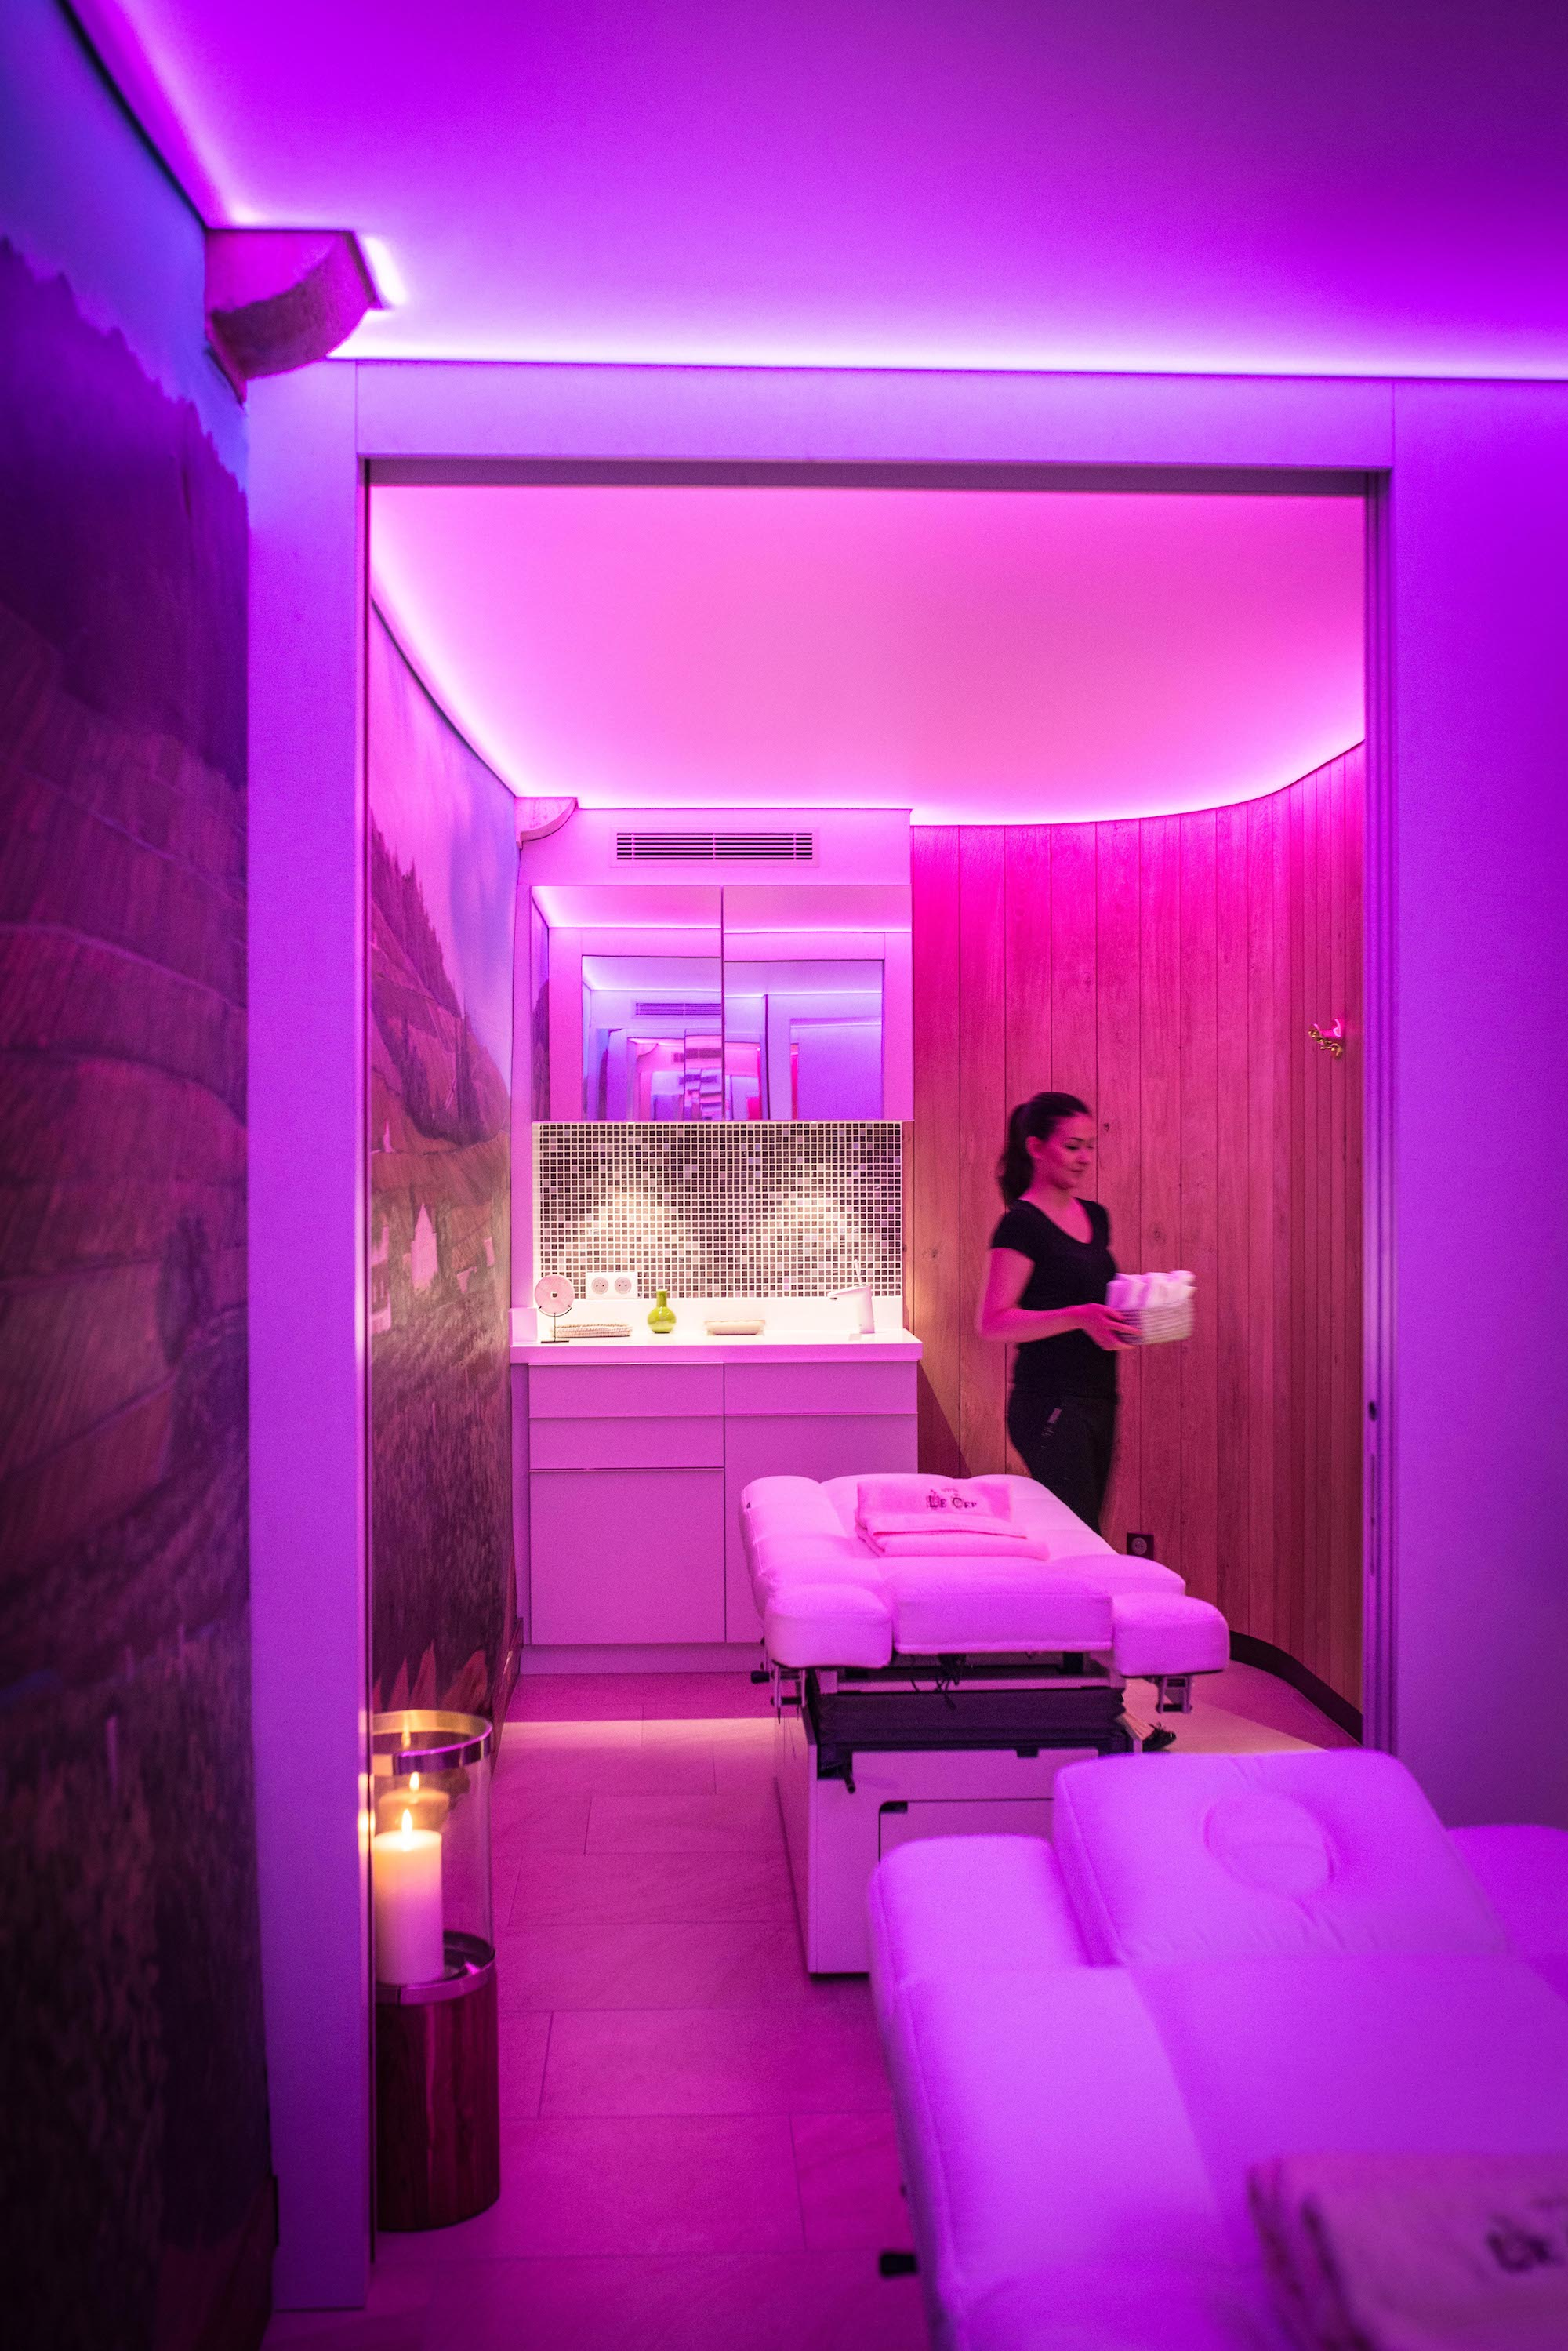 10 cryo 21 body session 1 free coffret cadeau en r gion bourgogne franche comt beaune. Black Bedroom Furniture Sets. Home Design Ideas